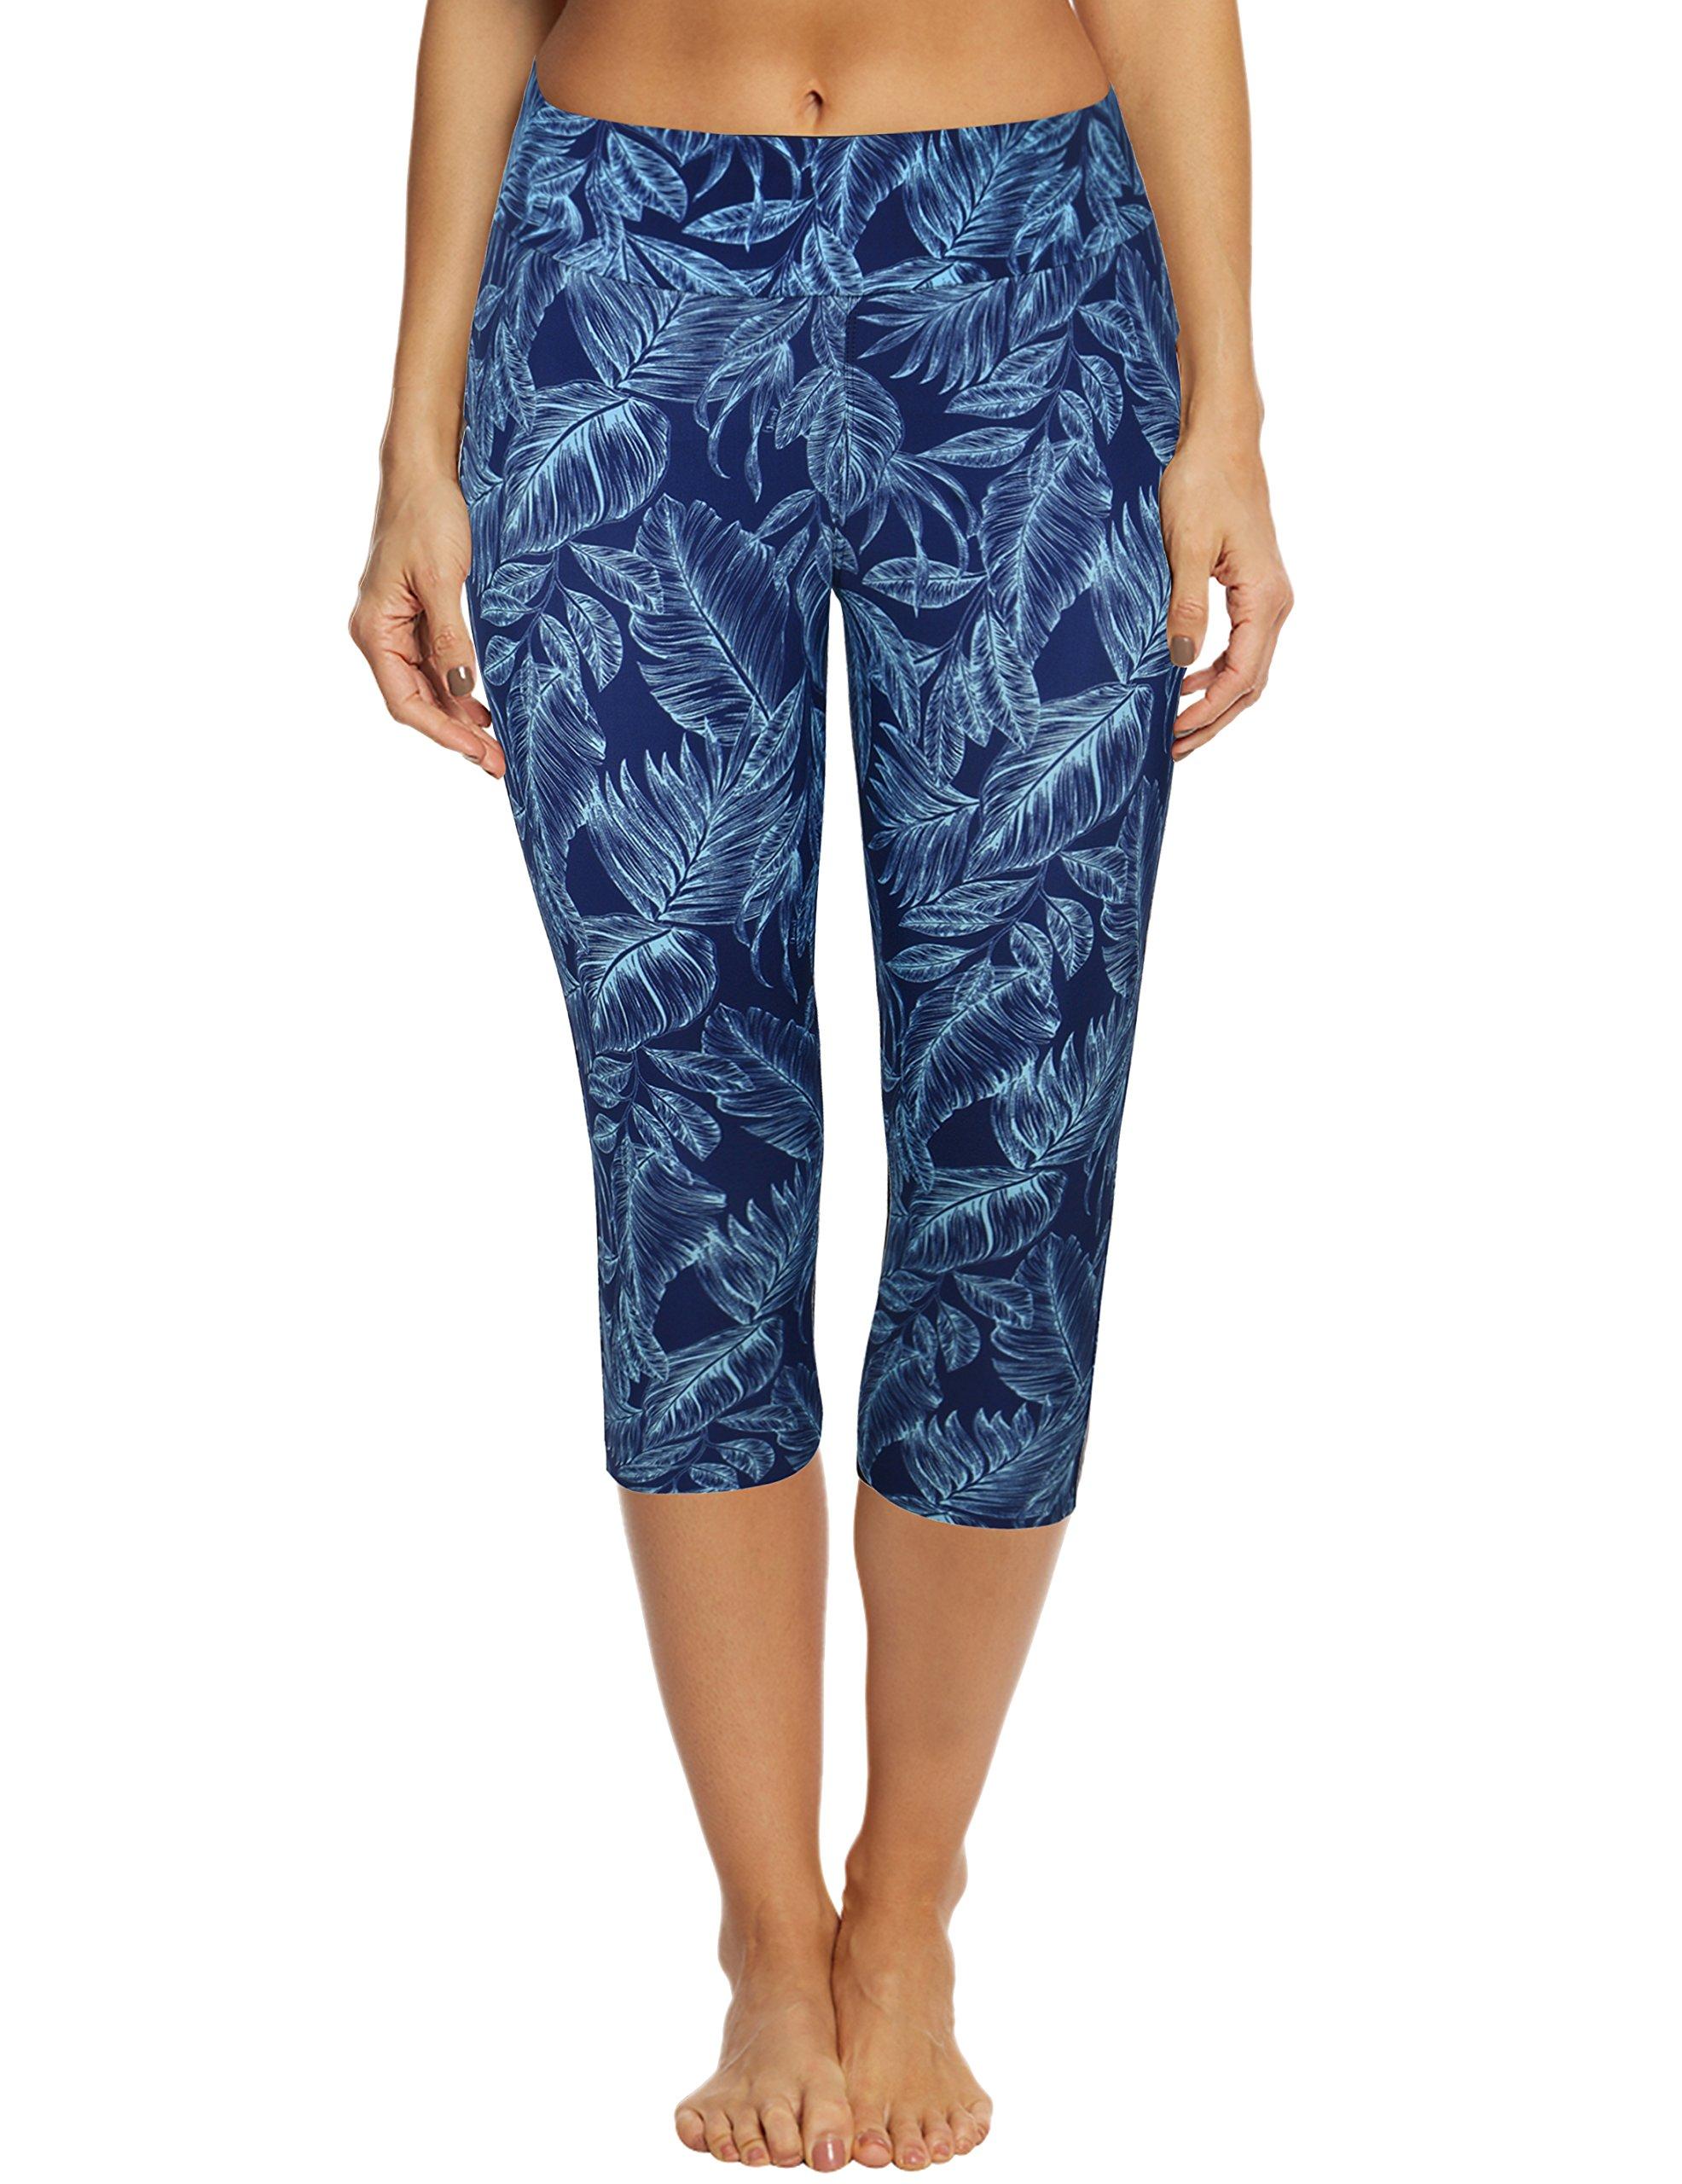 c20eb3ebac Septangle Women's Swim Pants Capris UPF 50+ Water Outdoor Sport Leggings  product image